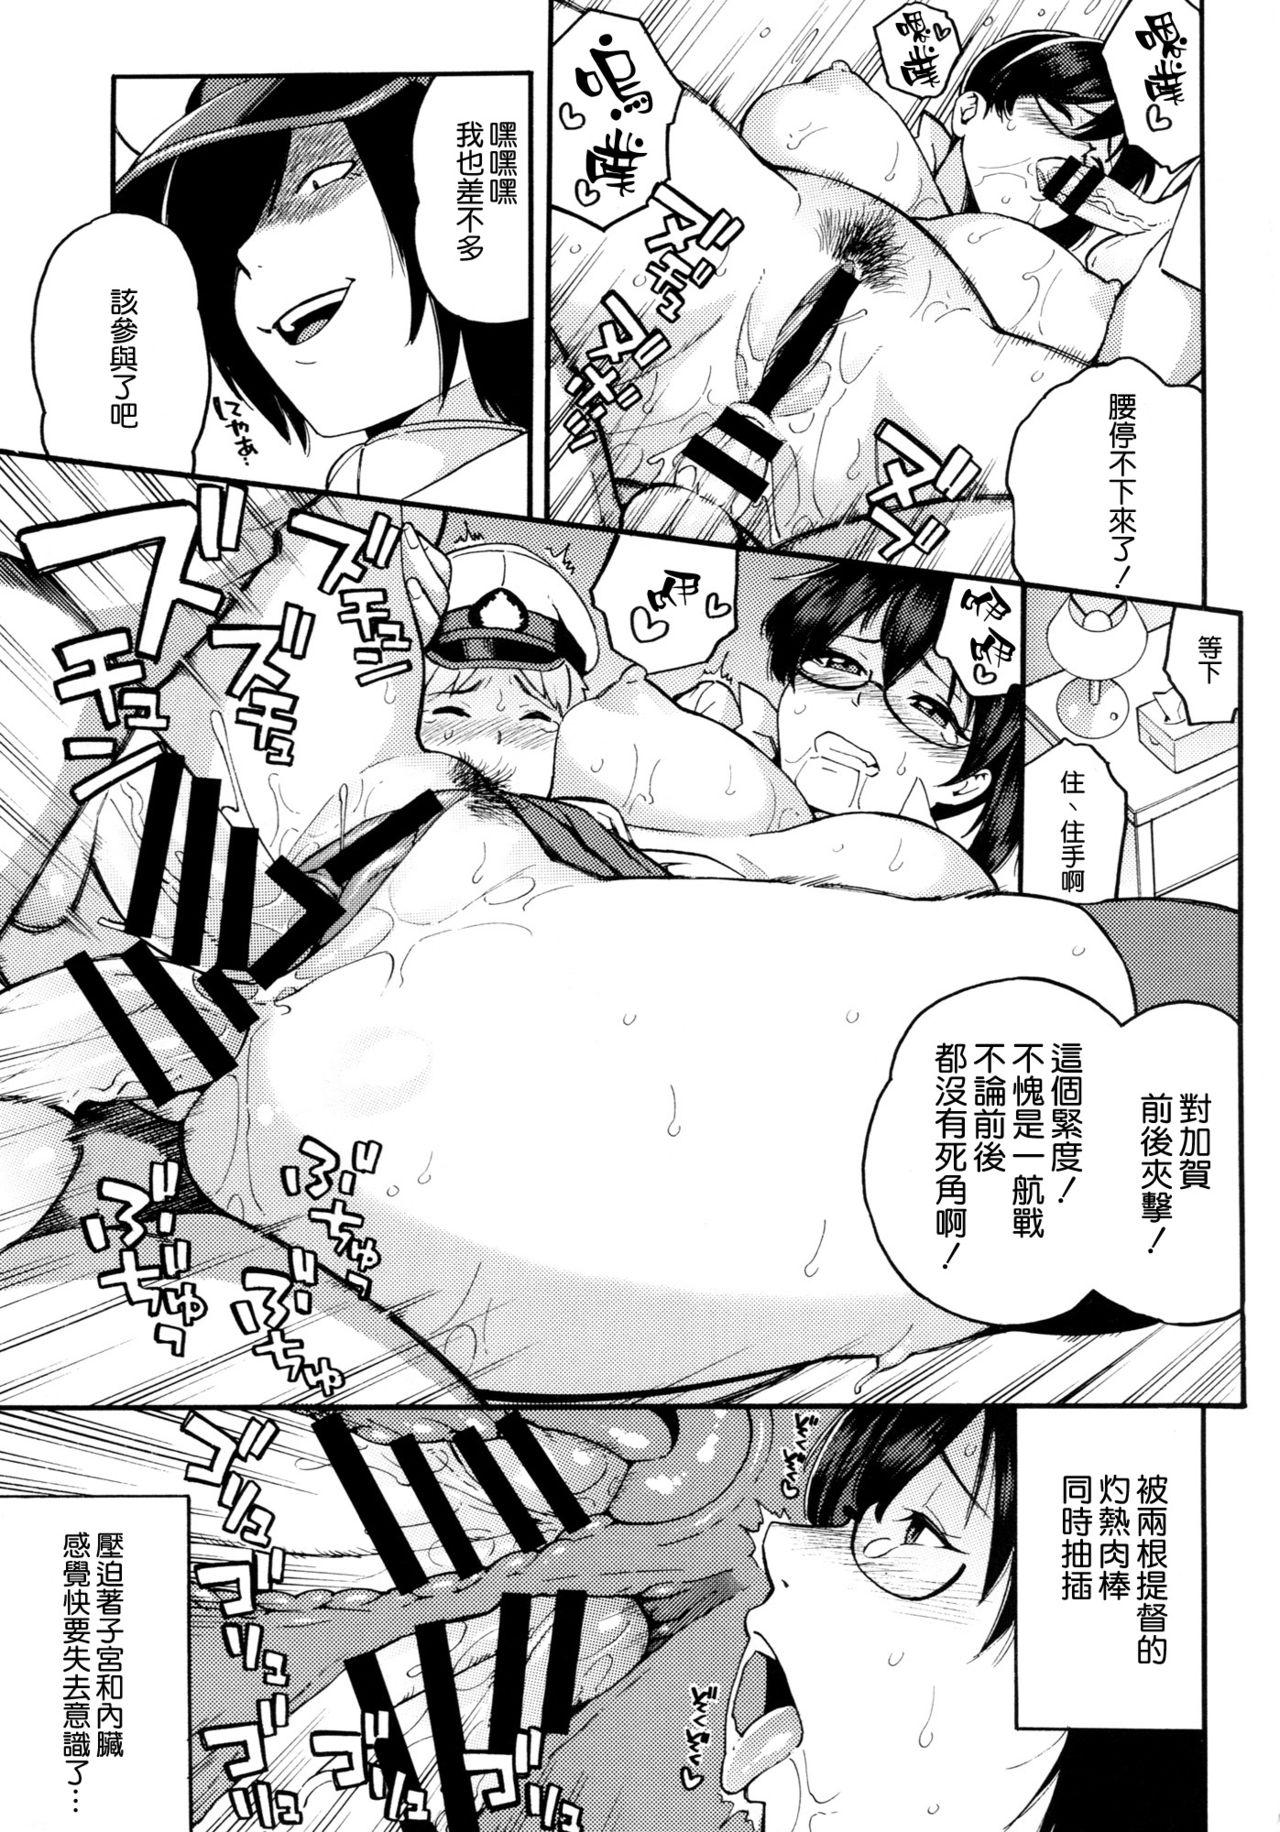 Oshiete! Kaga-sensei 12